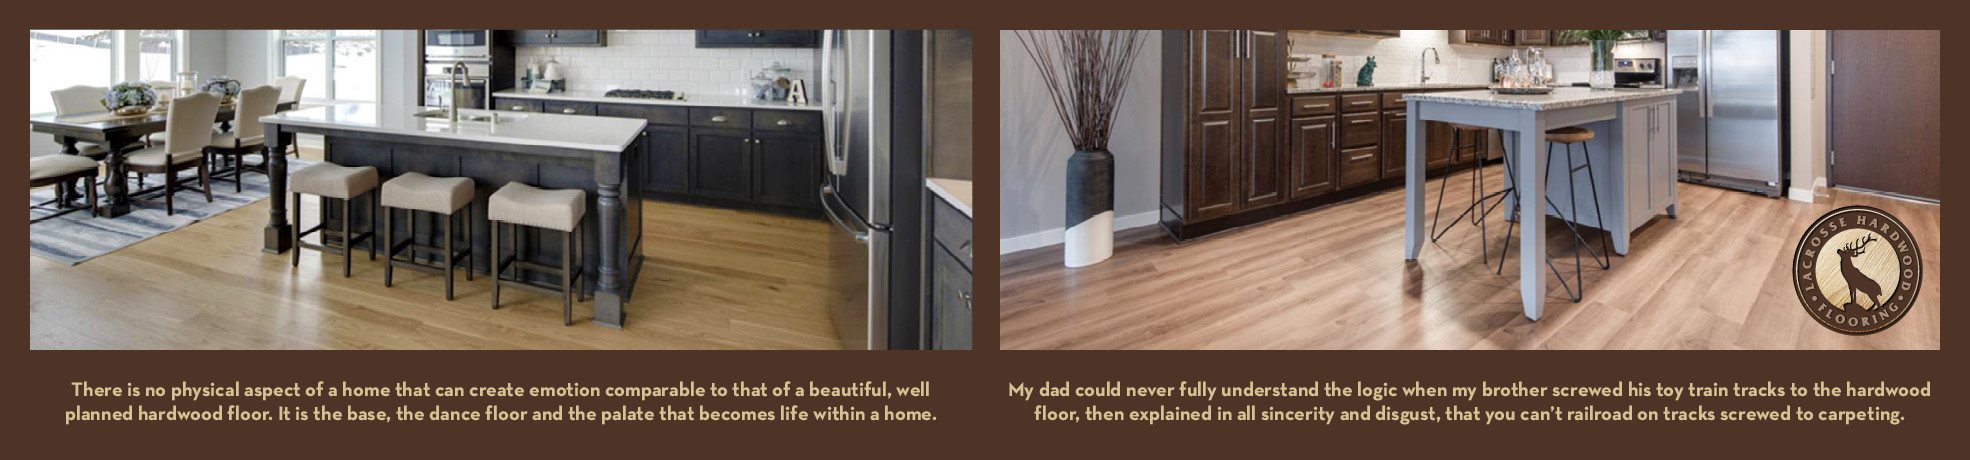 hardwood floor installation minneapolis of lacrosse hardwood flooring walnut white oak red oak hickory with lhfsliderv24